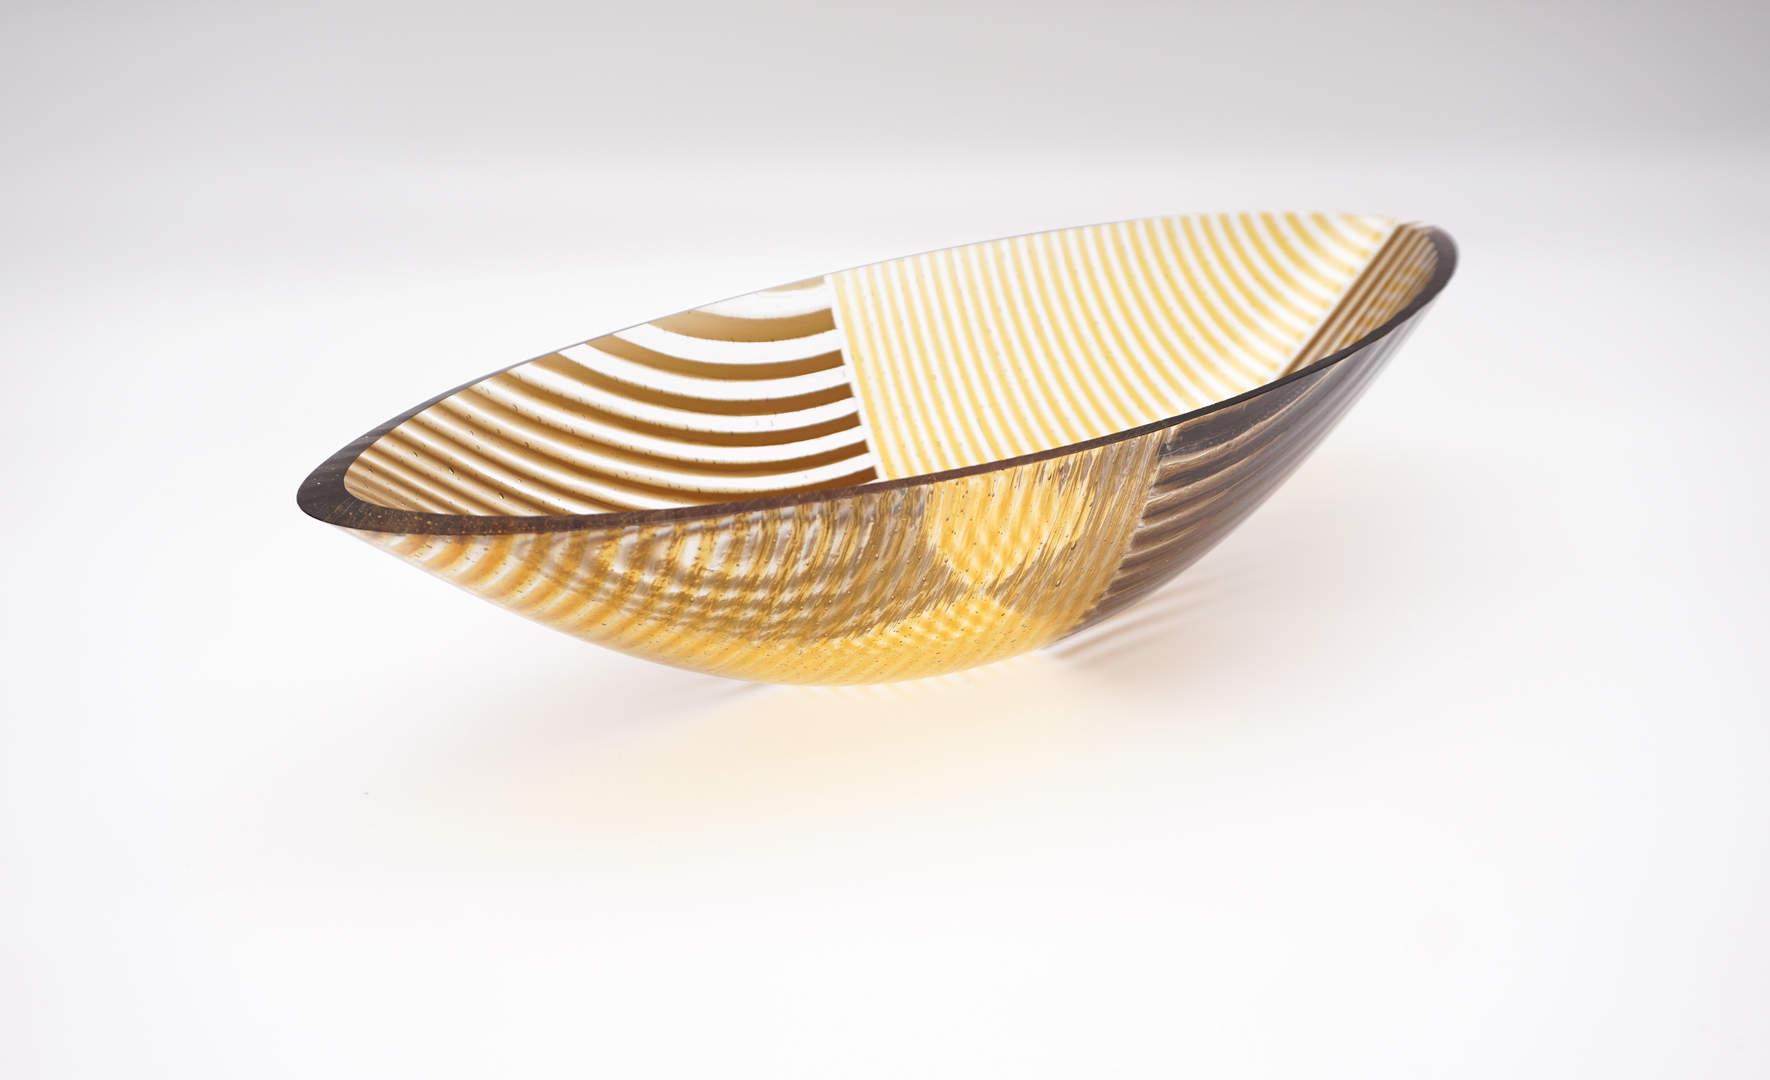 Schale - Golden Striped Boat